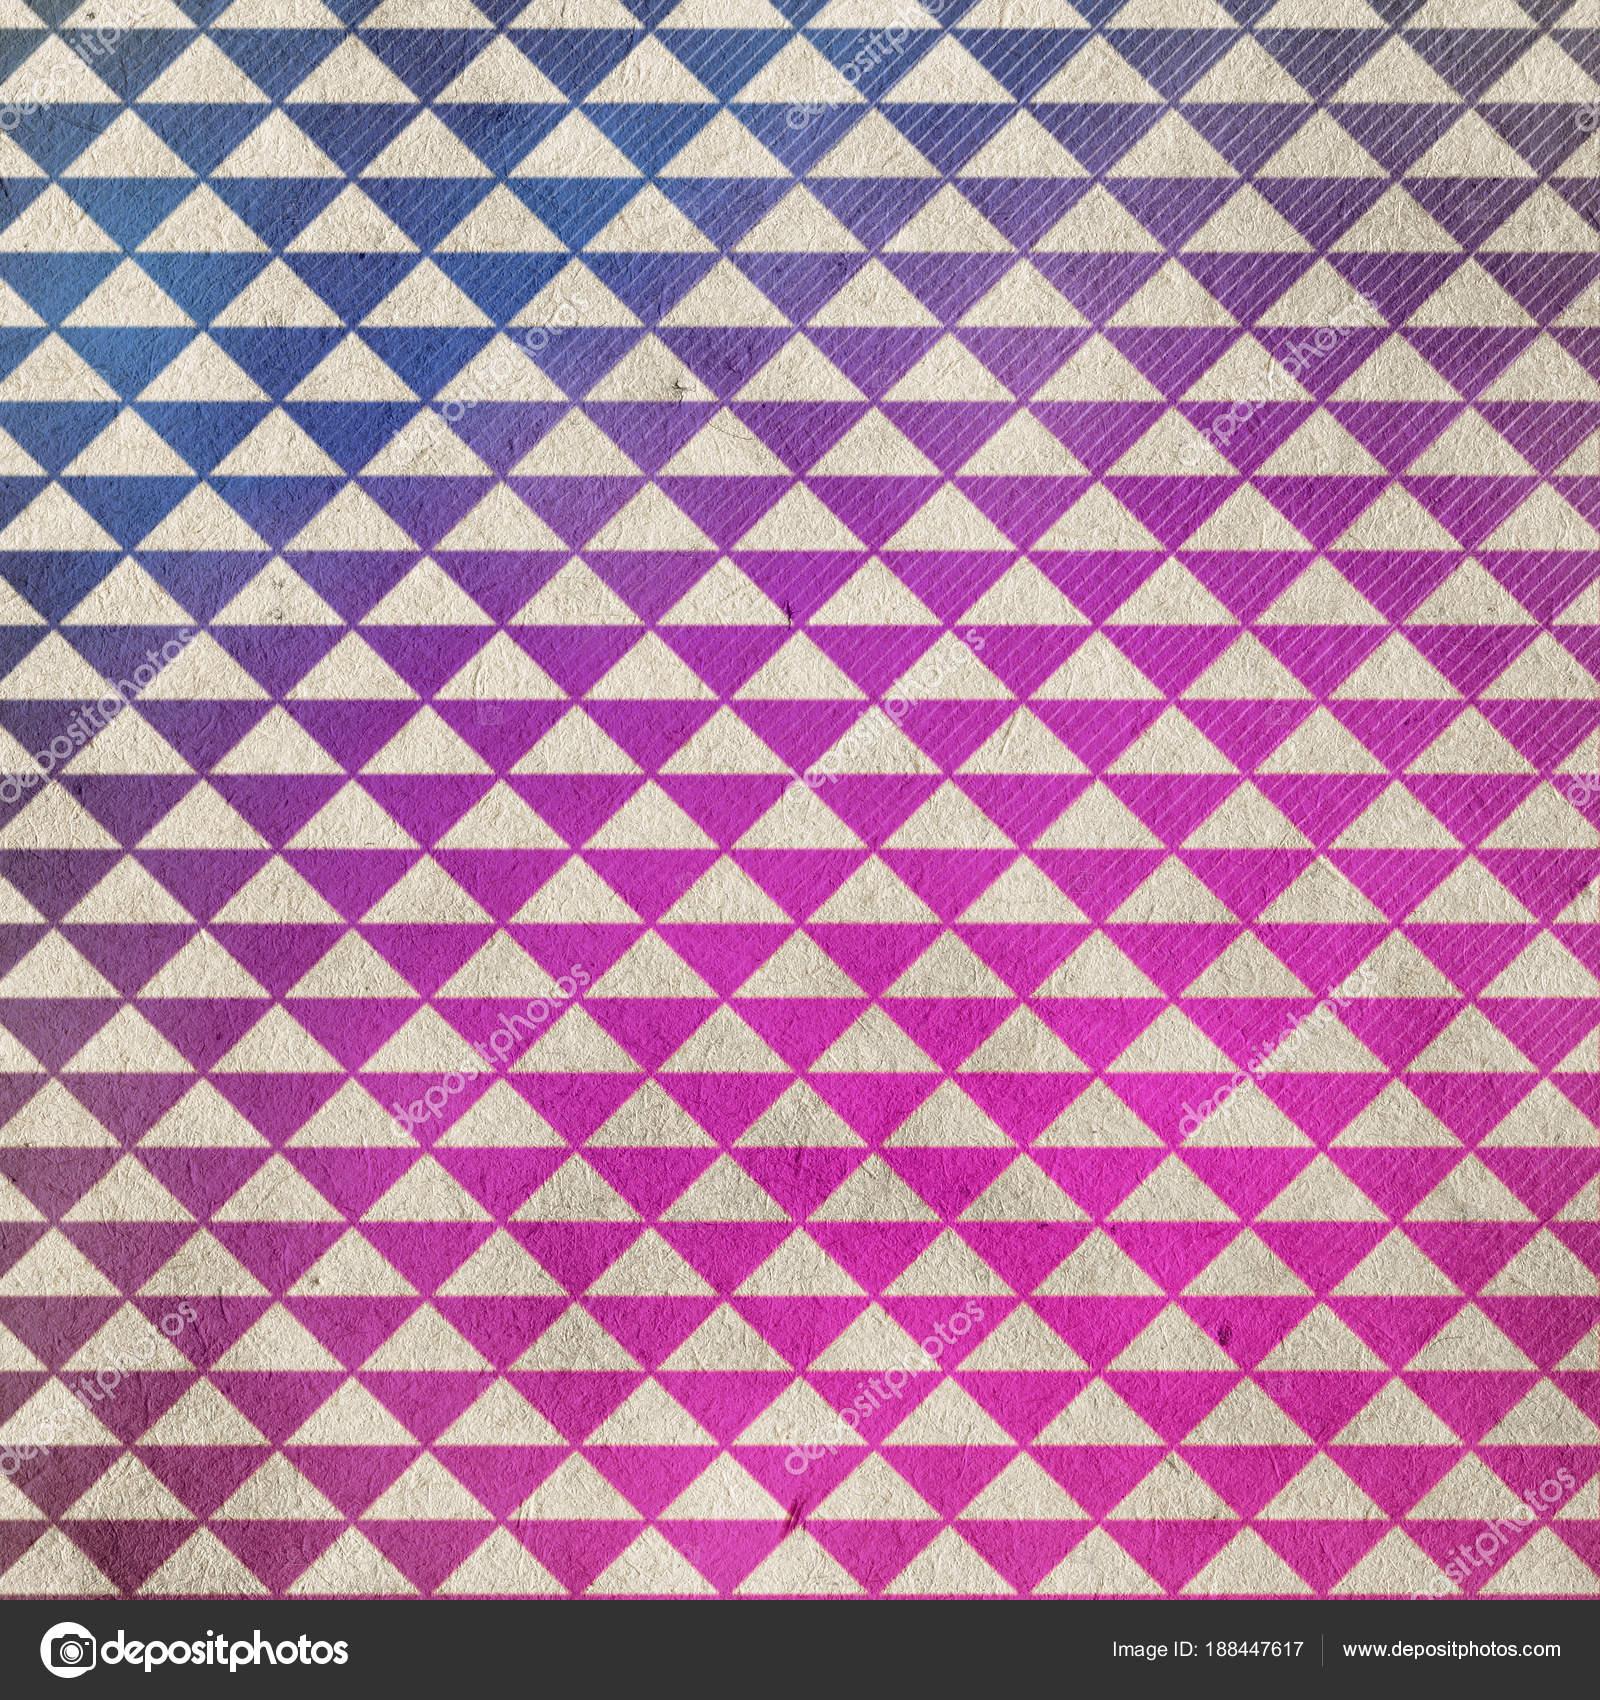 alte retro muster auf dem grunge papier rosa farben stockfoto - Bastelpapier Muster